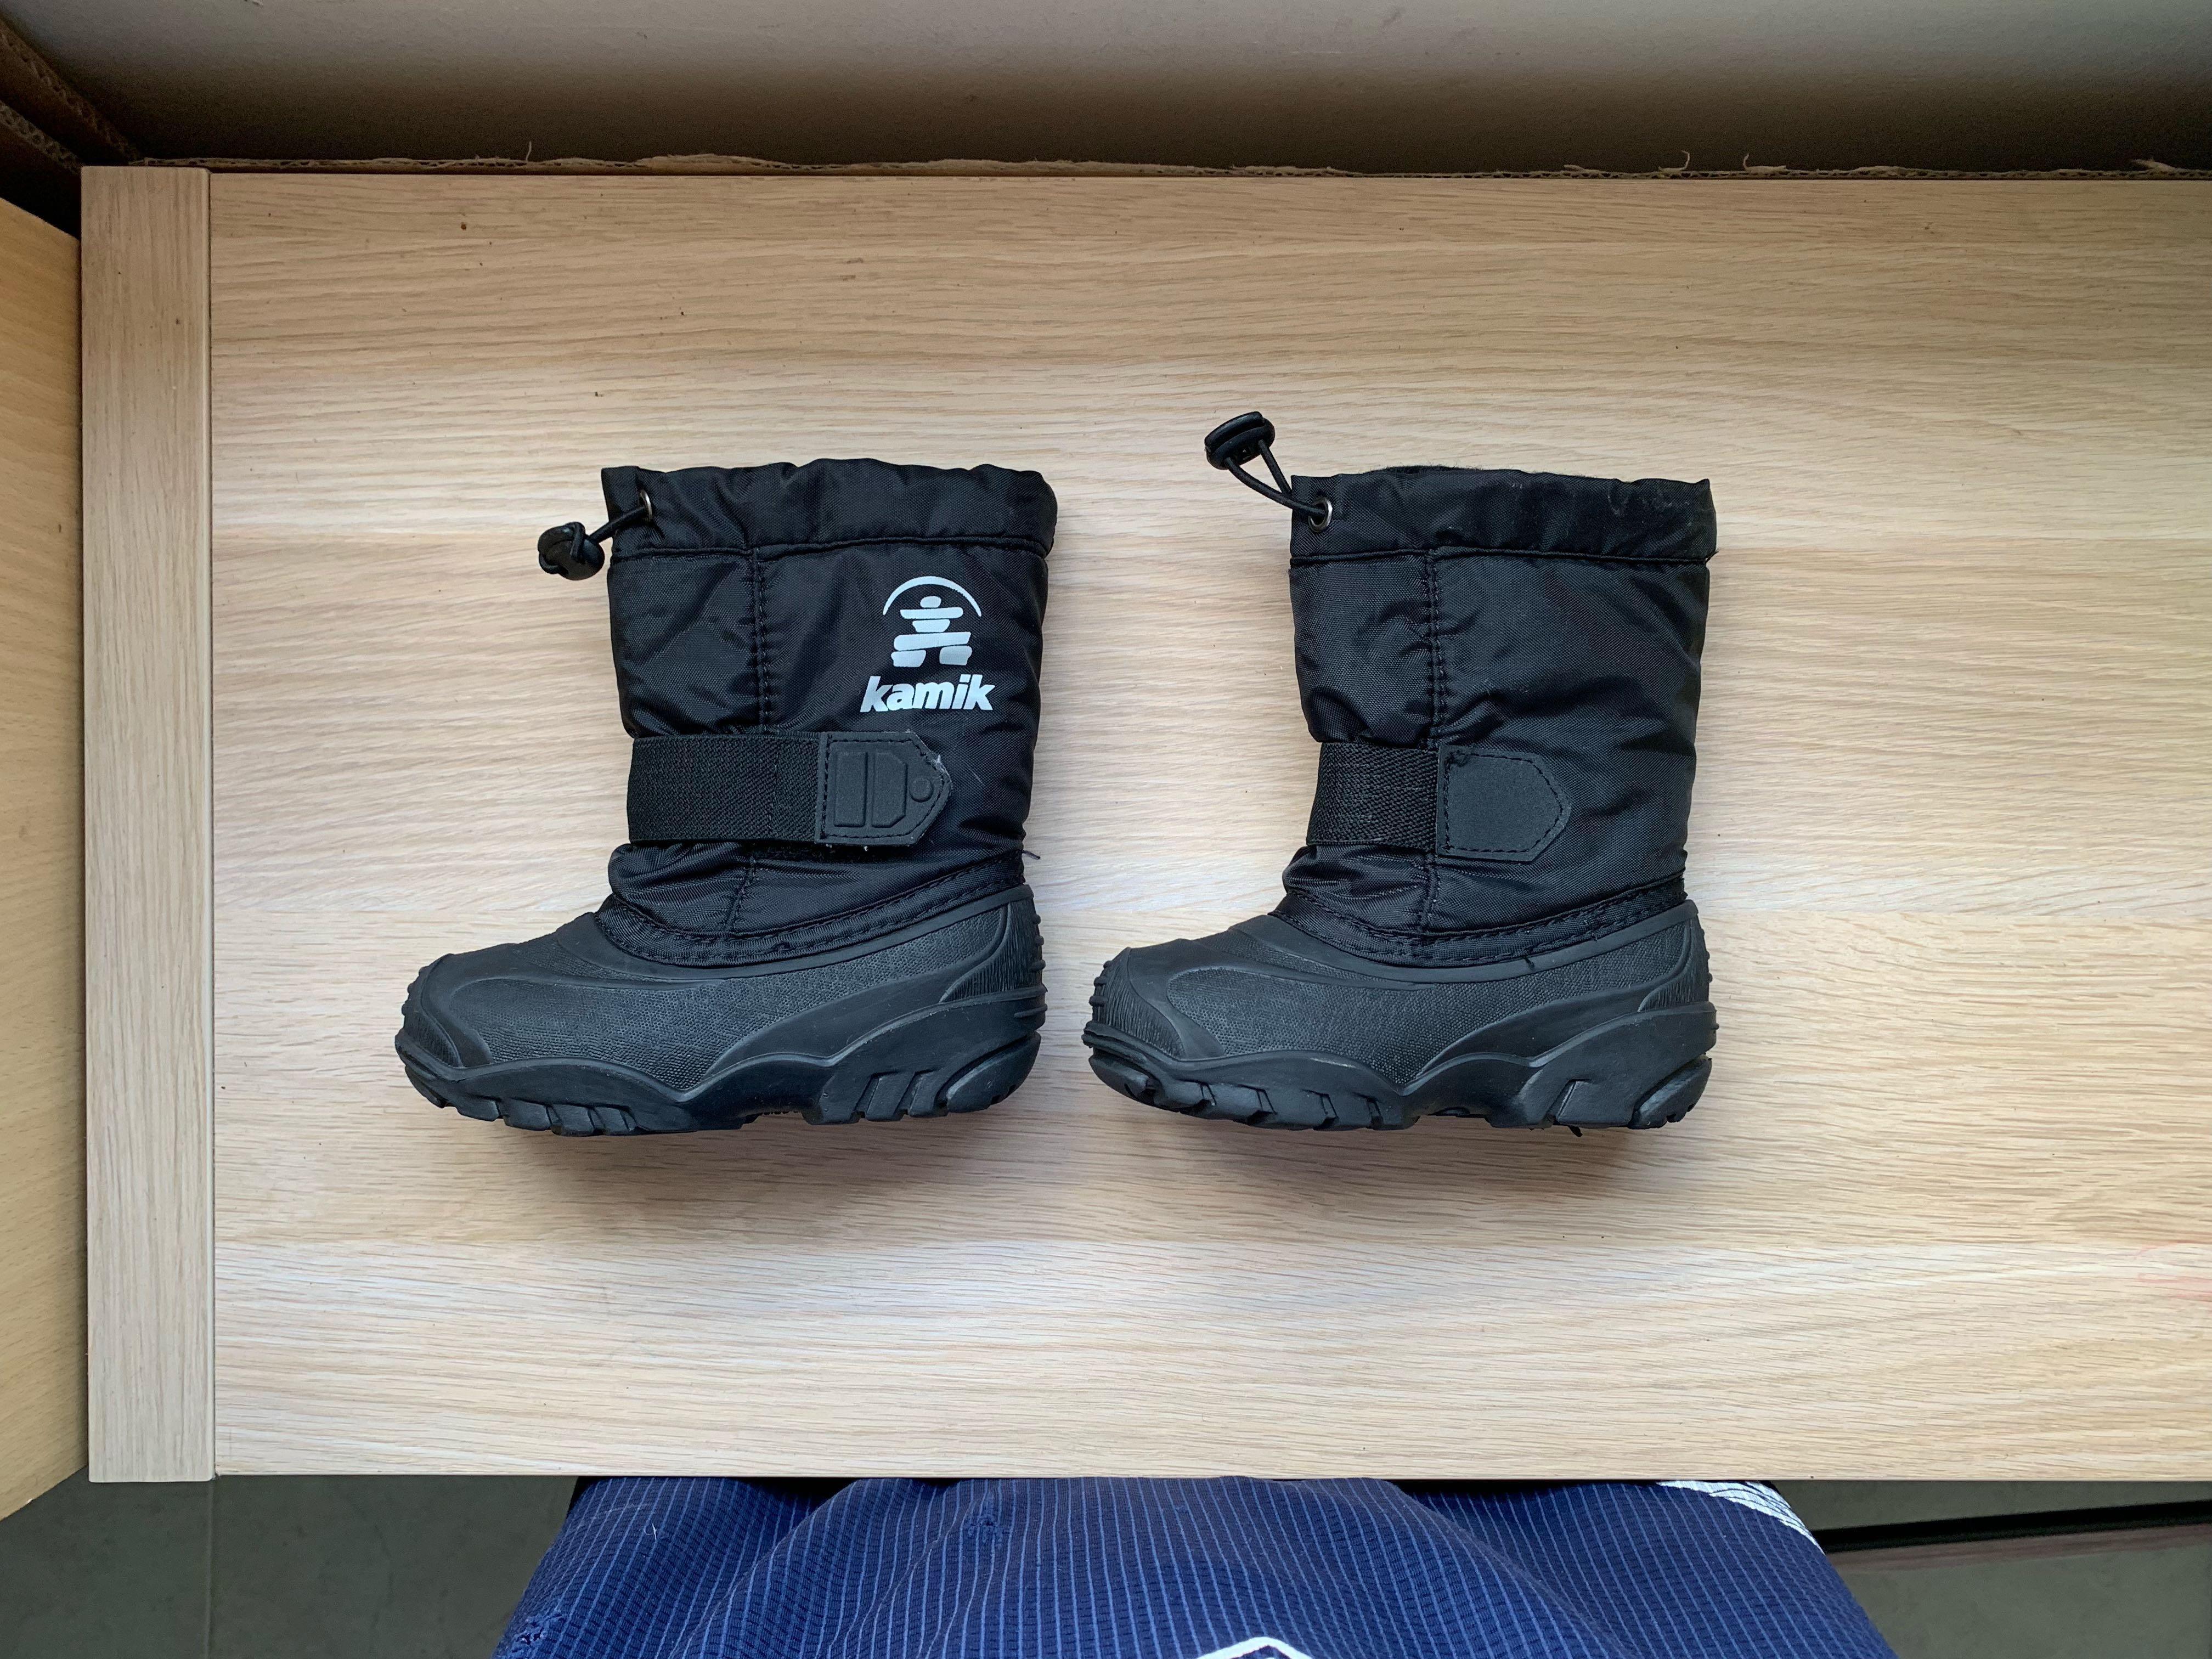 Kids / Infant Winter Boots (Kamik